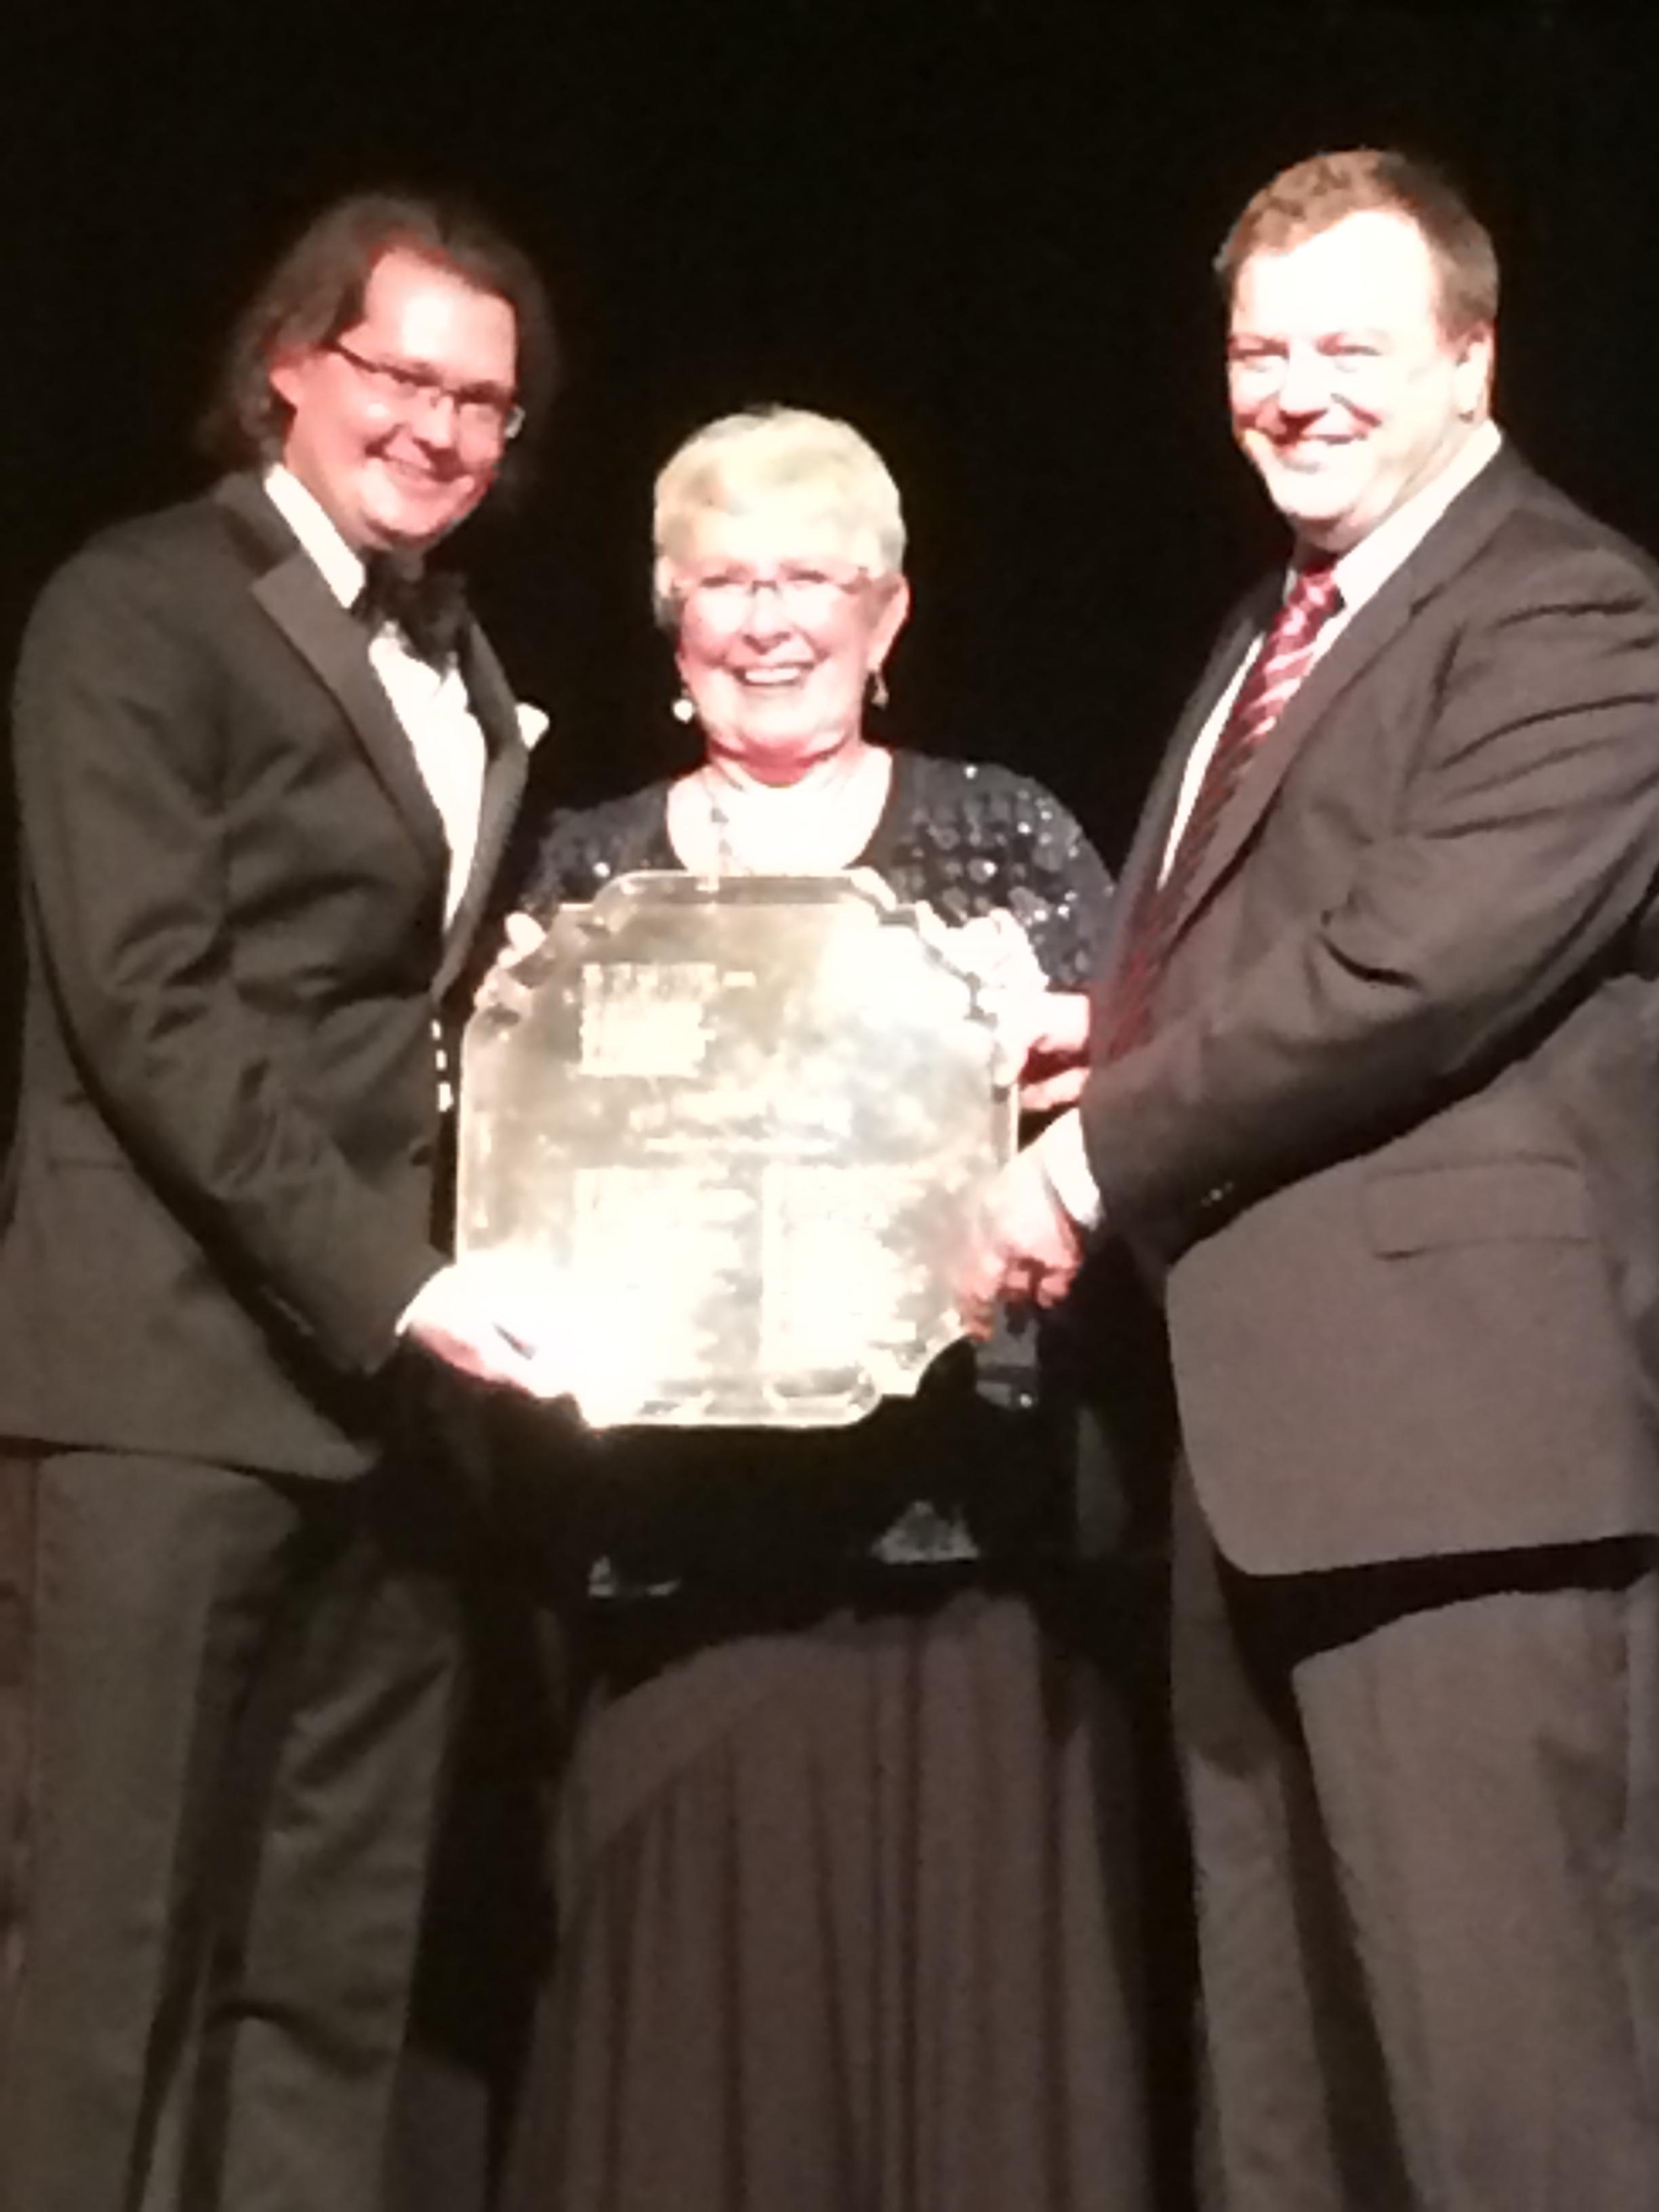 Robert and John Glynn with Phyllis Harlan, ACBL President, Bermuda